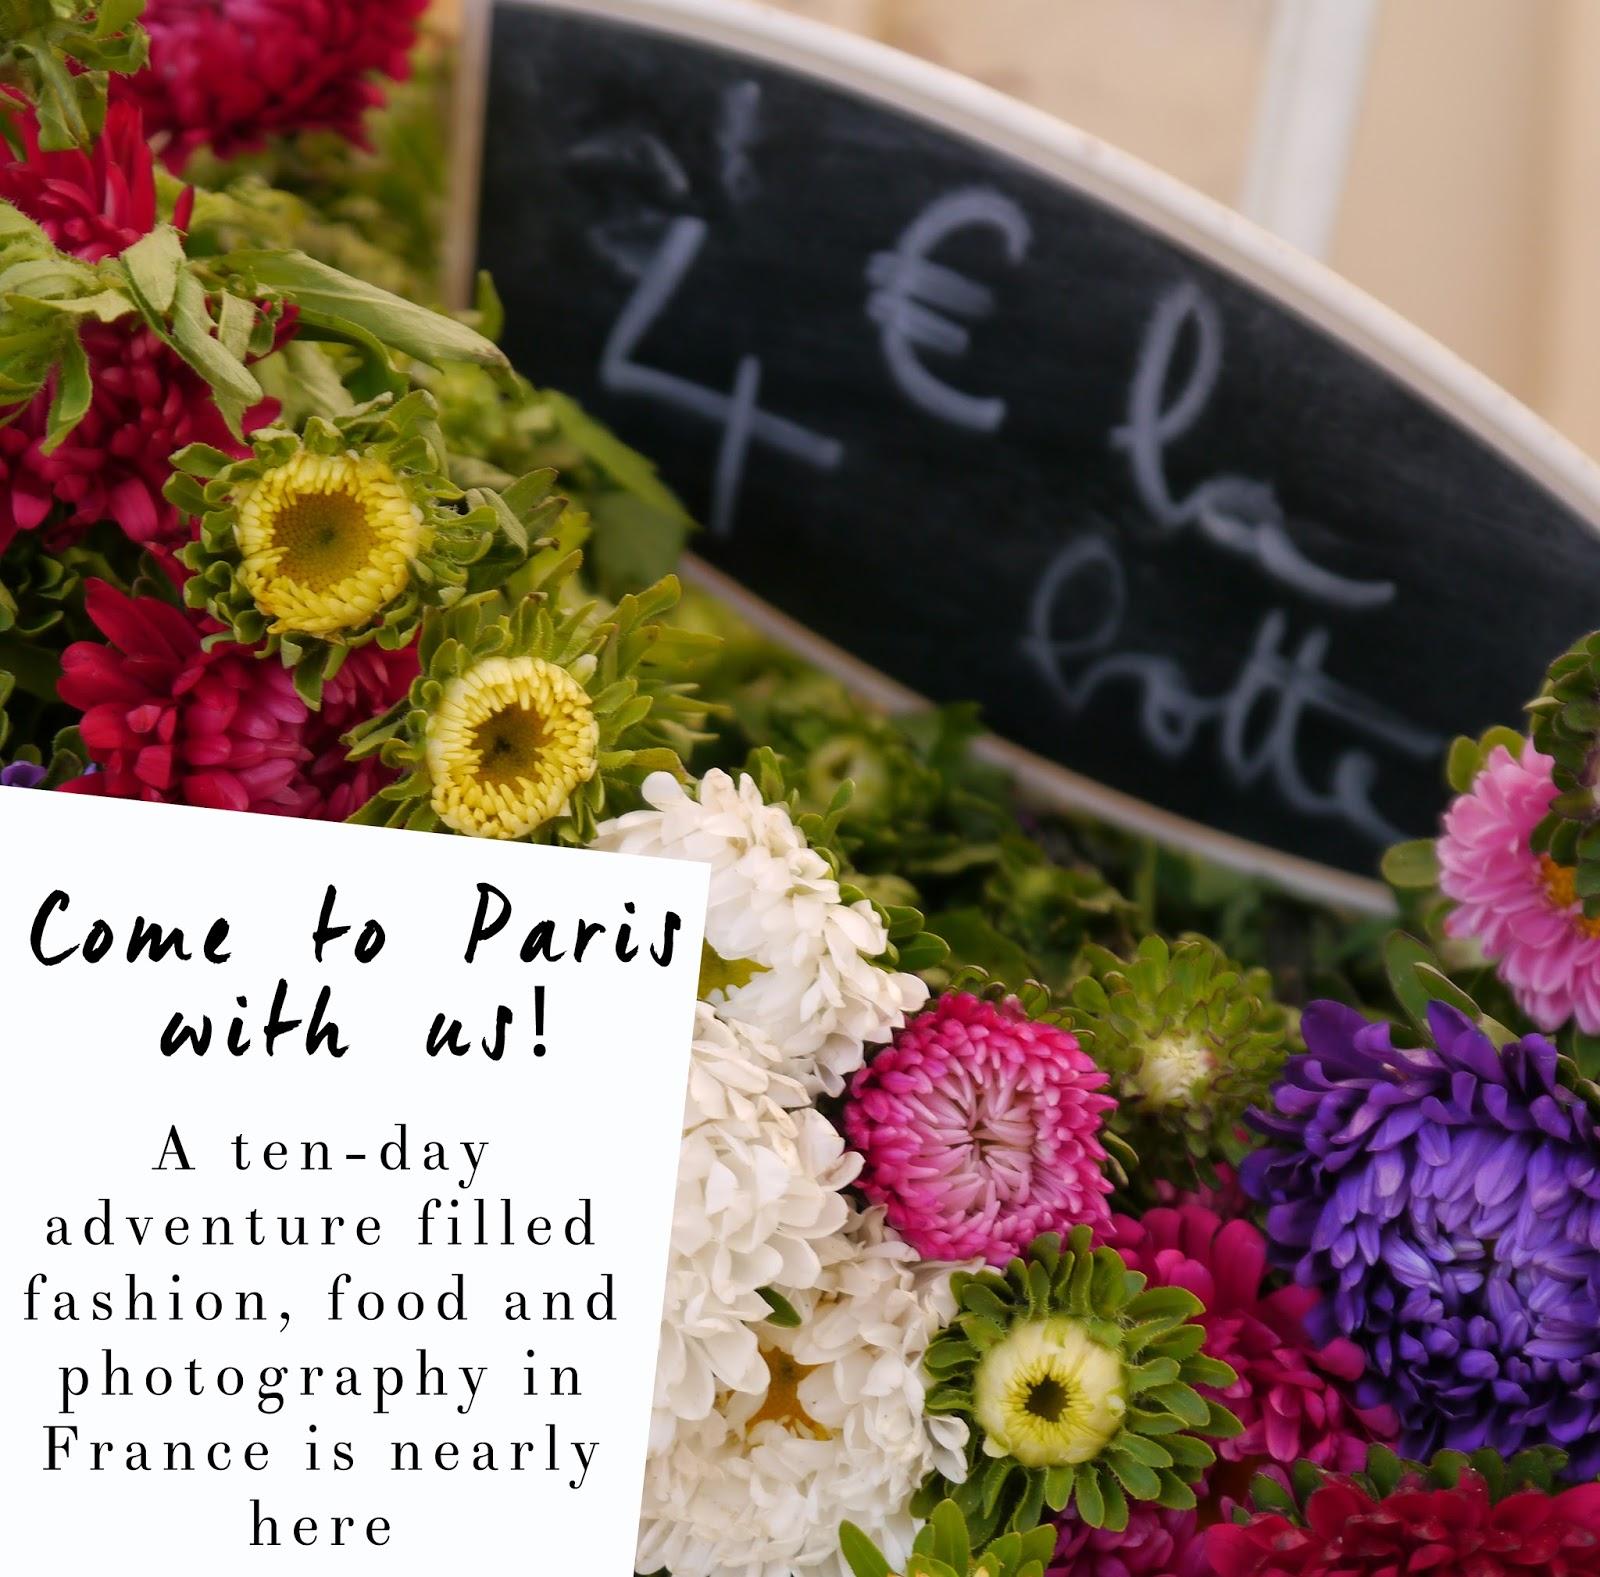 coco and vera, top vancouver fashion blog, top vancouver travel blog, paris, france, dahlias, flowers, invitation